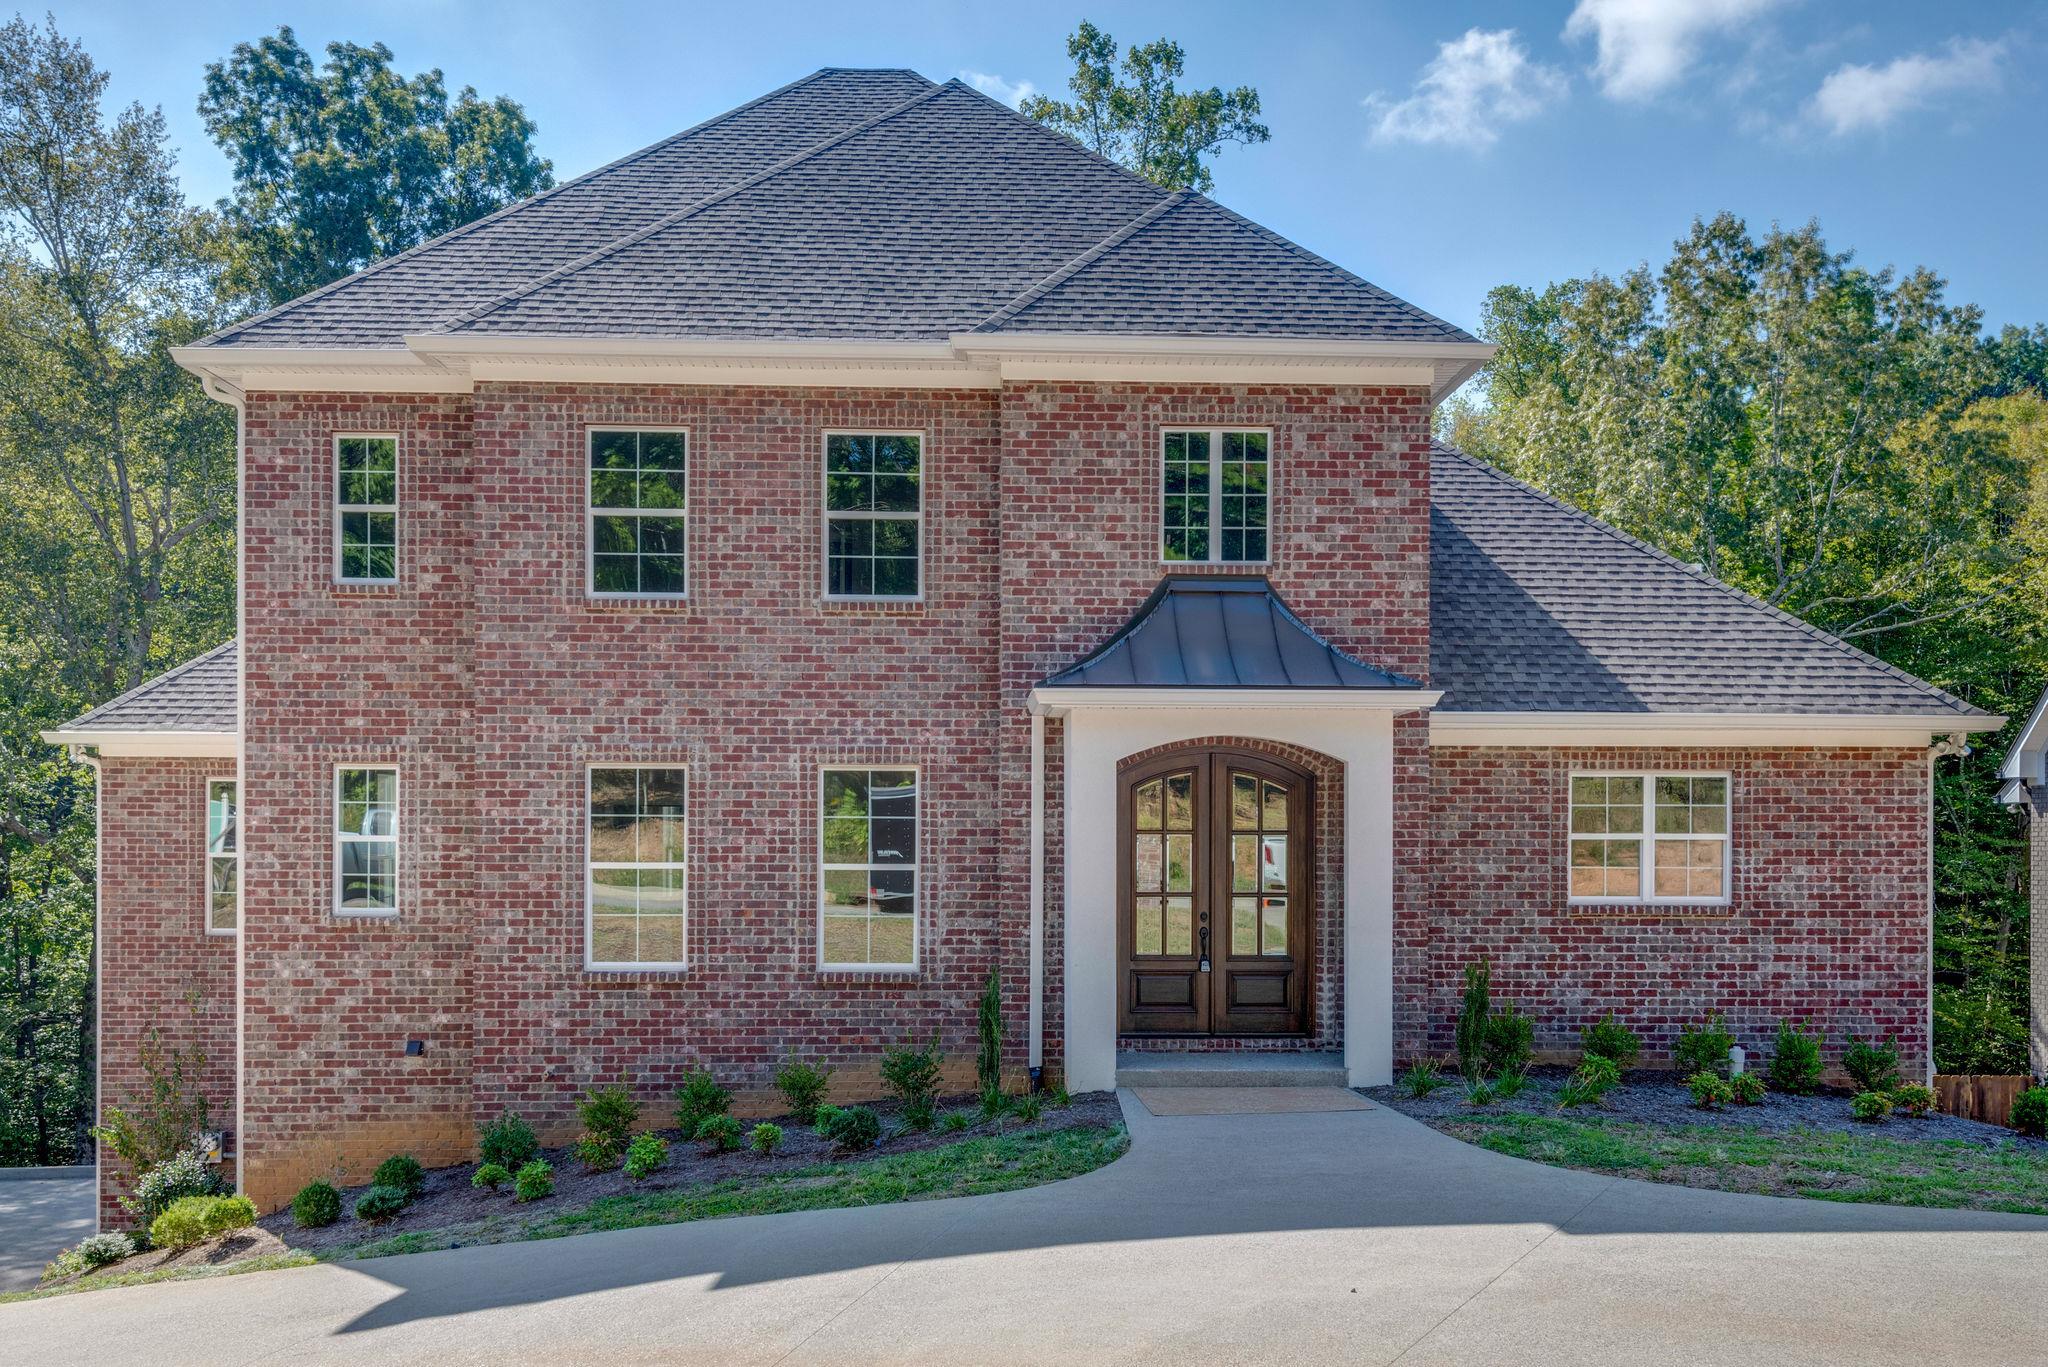 7170 Kyles Creek Dr, Fairview, TN 37062 - Fairview, TN real estate listing